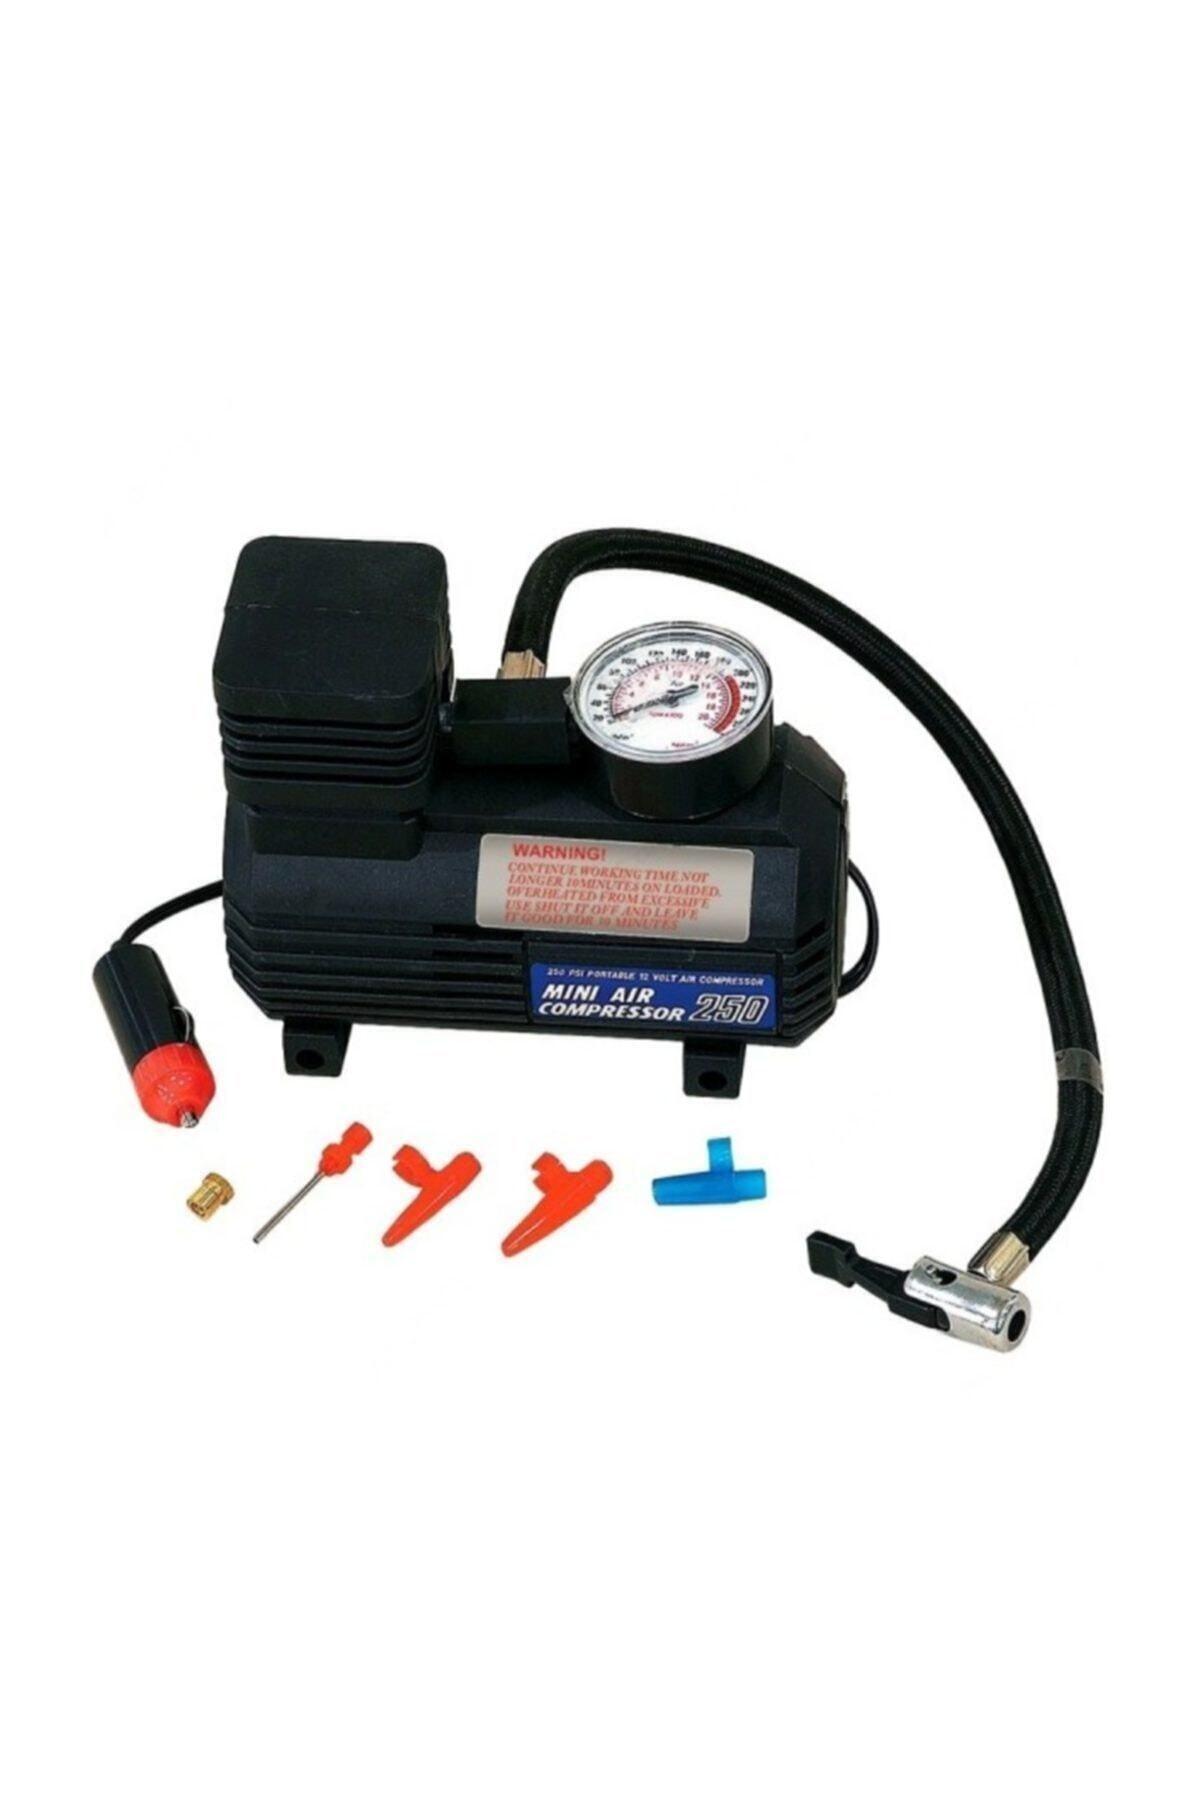 Şeftali Air Compressor Hava Kompresörü Oto Araç Lastik Şişirme Kiti 1